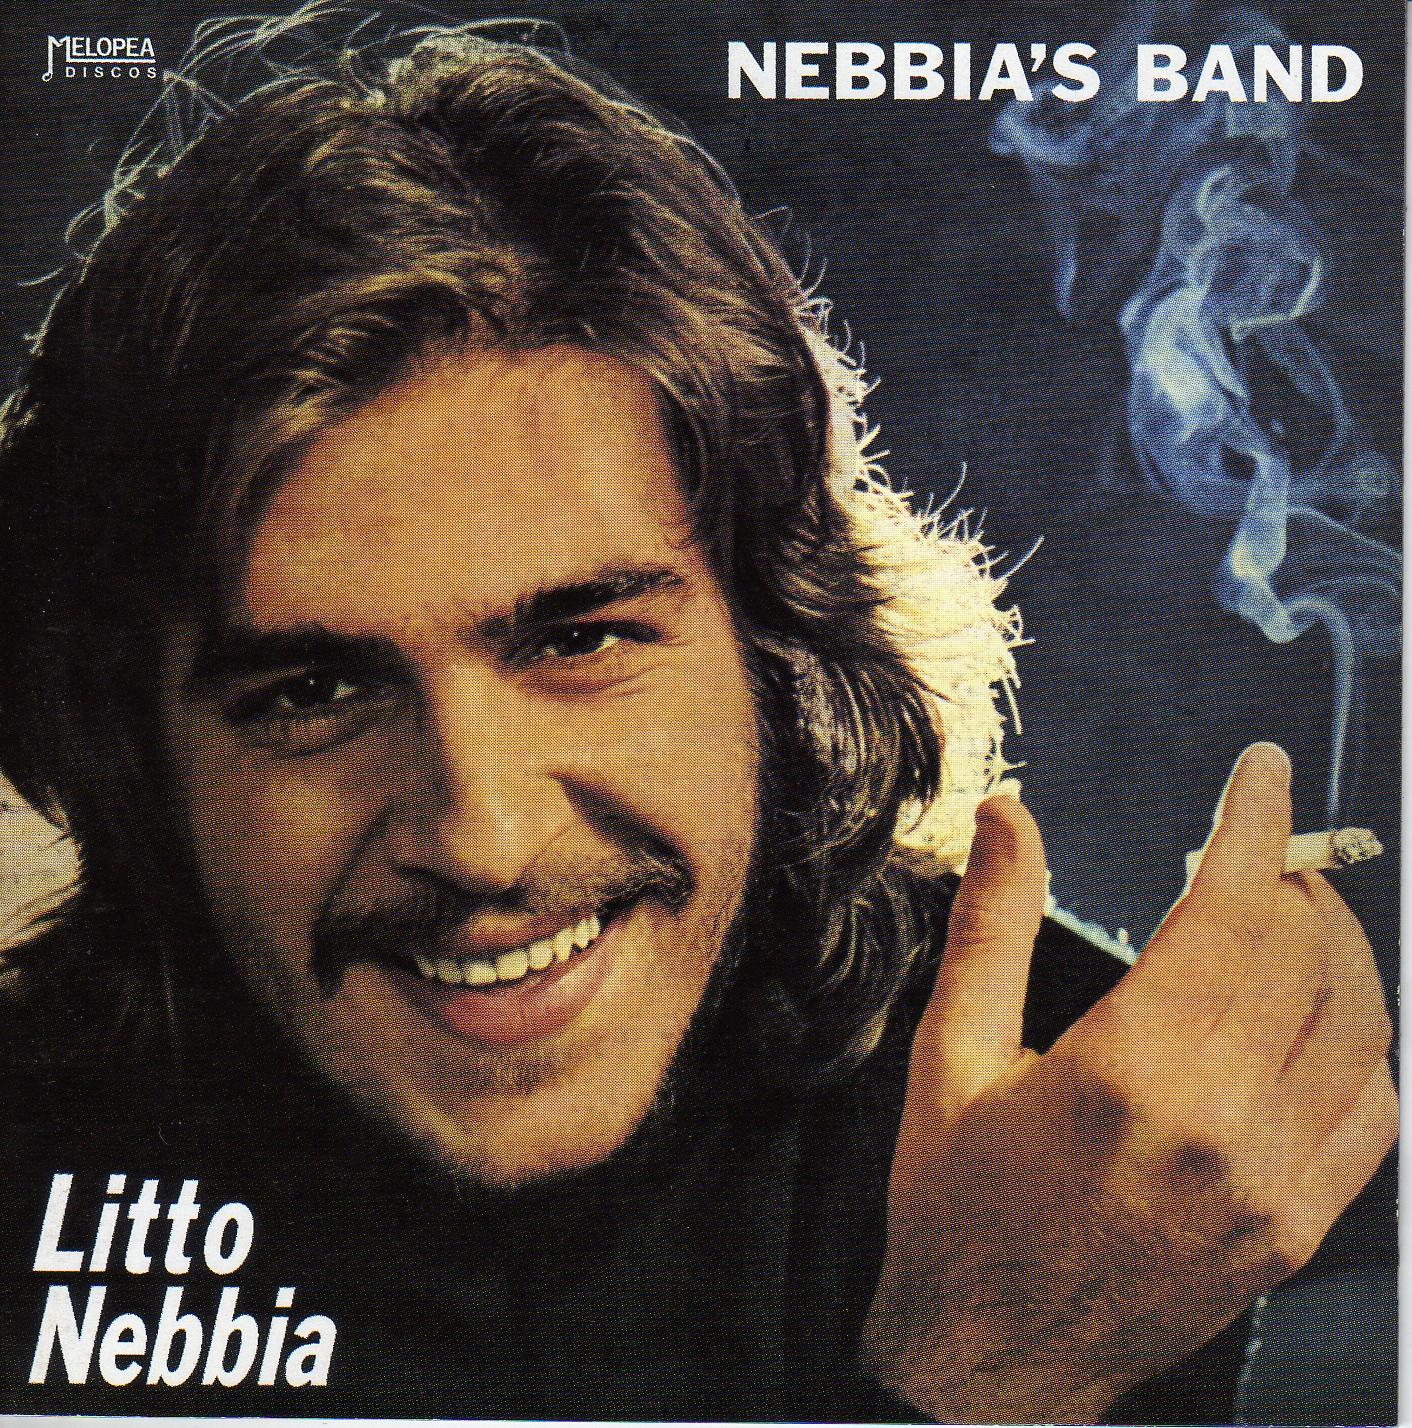 [1971+Litto+Nebbia+Nebbia]